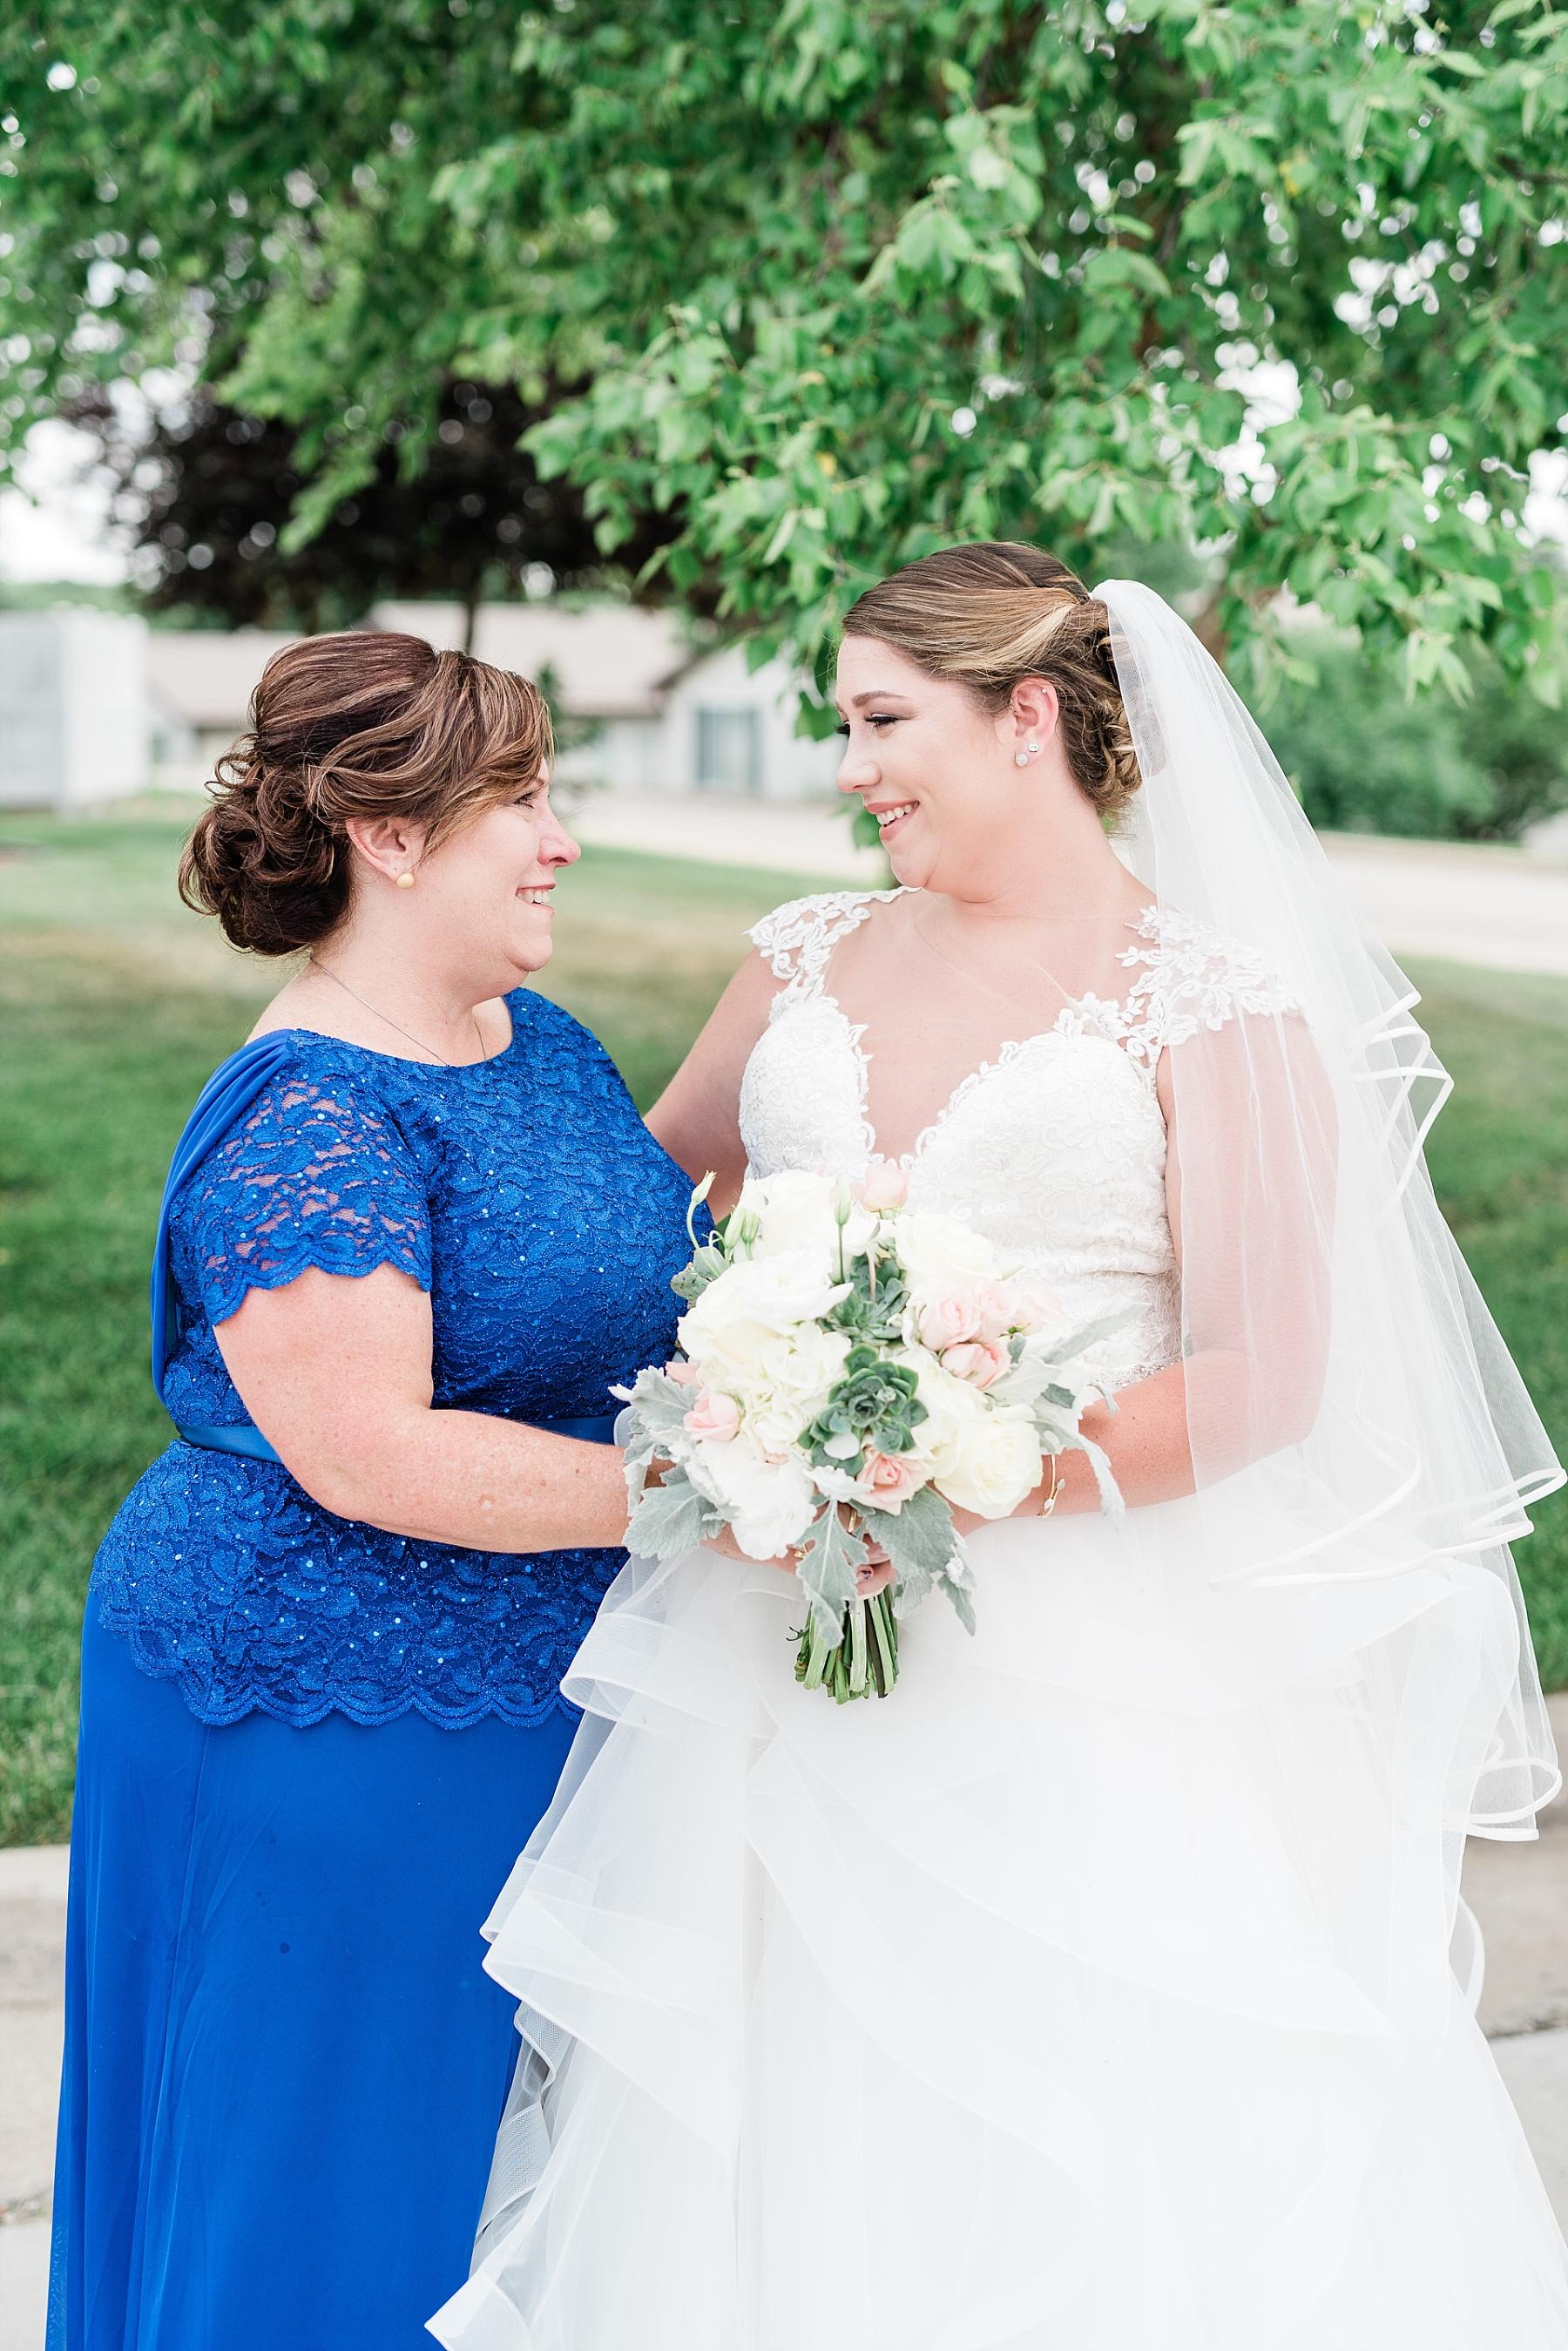 Baurichter Wedding at Stoney Creek Inn Columbia Missouri by Kelsi Kliethermes Photography_0006.jpg